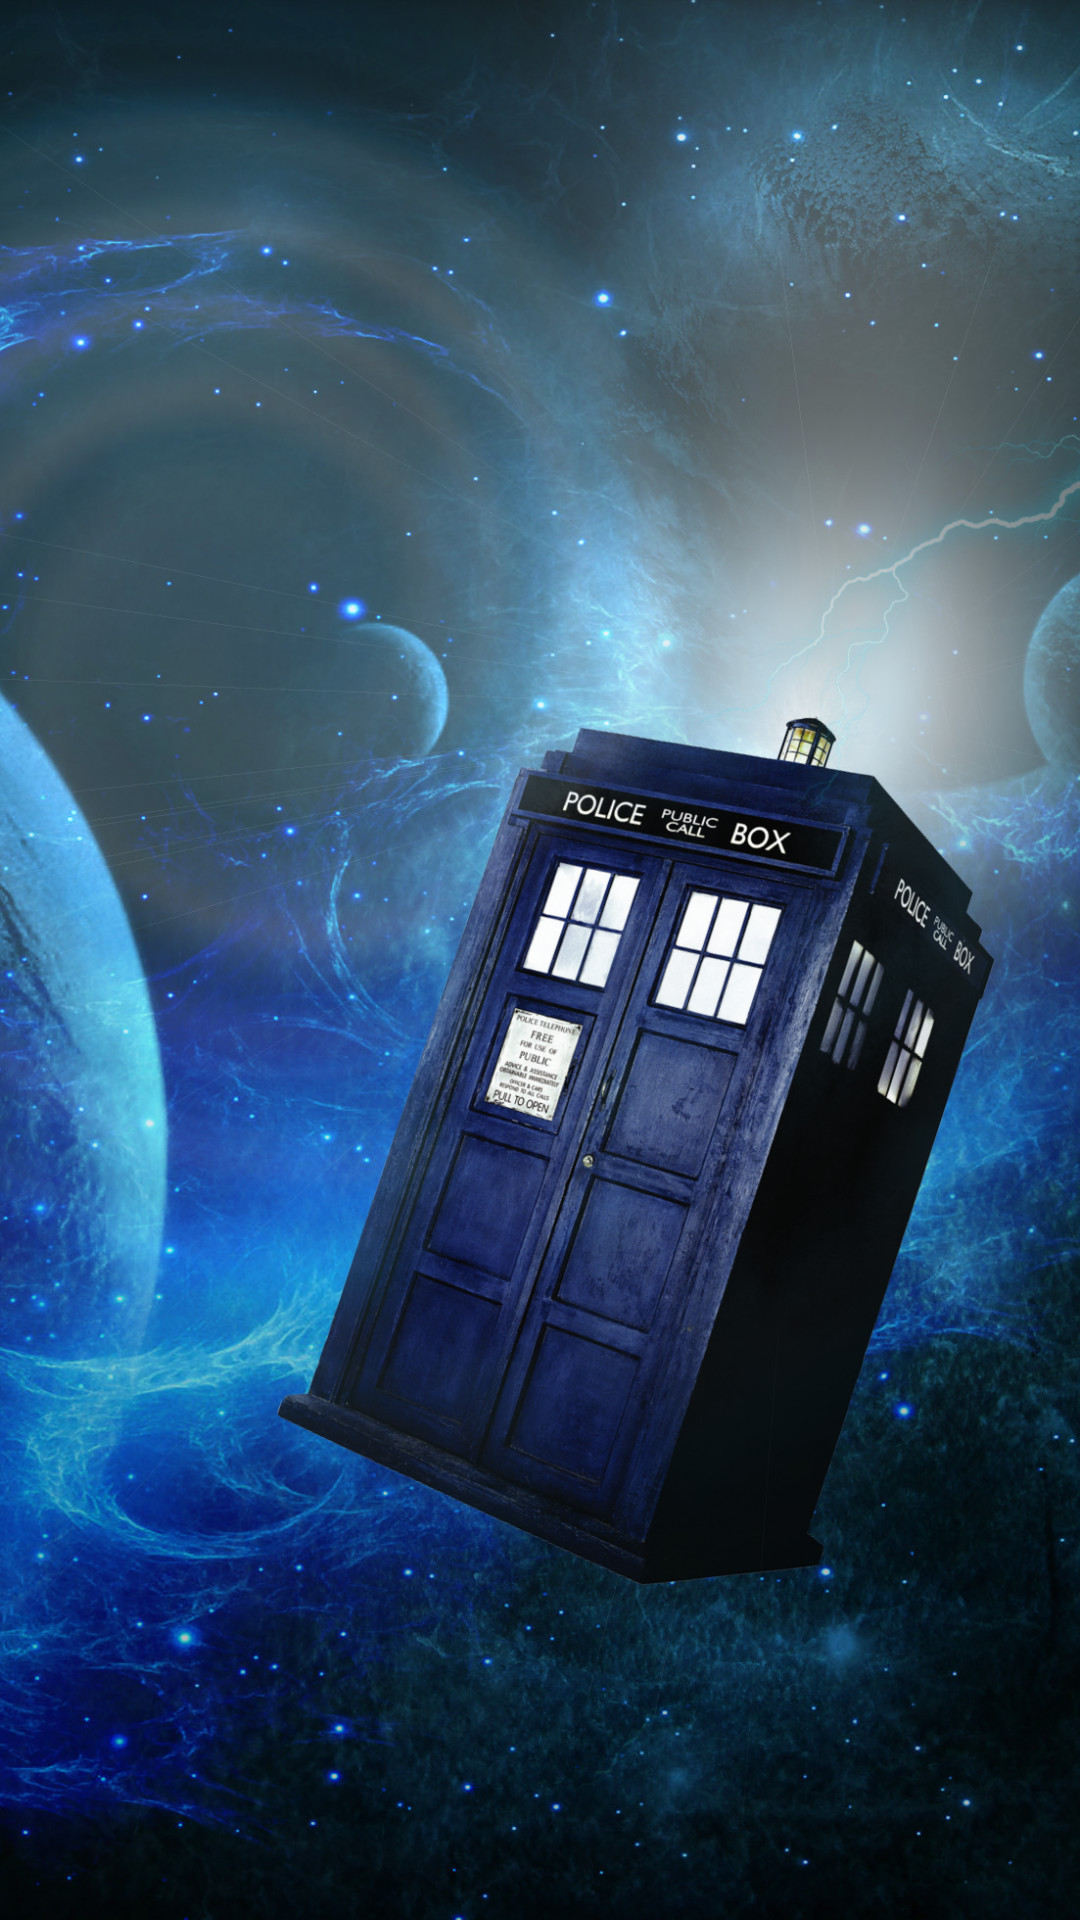 Doctor who tardis desktop wallpaper 67 images - Dr who wallpaper ...